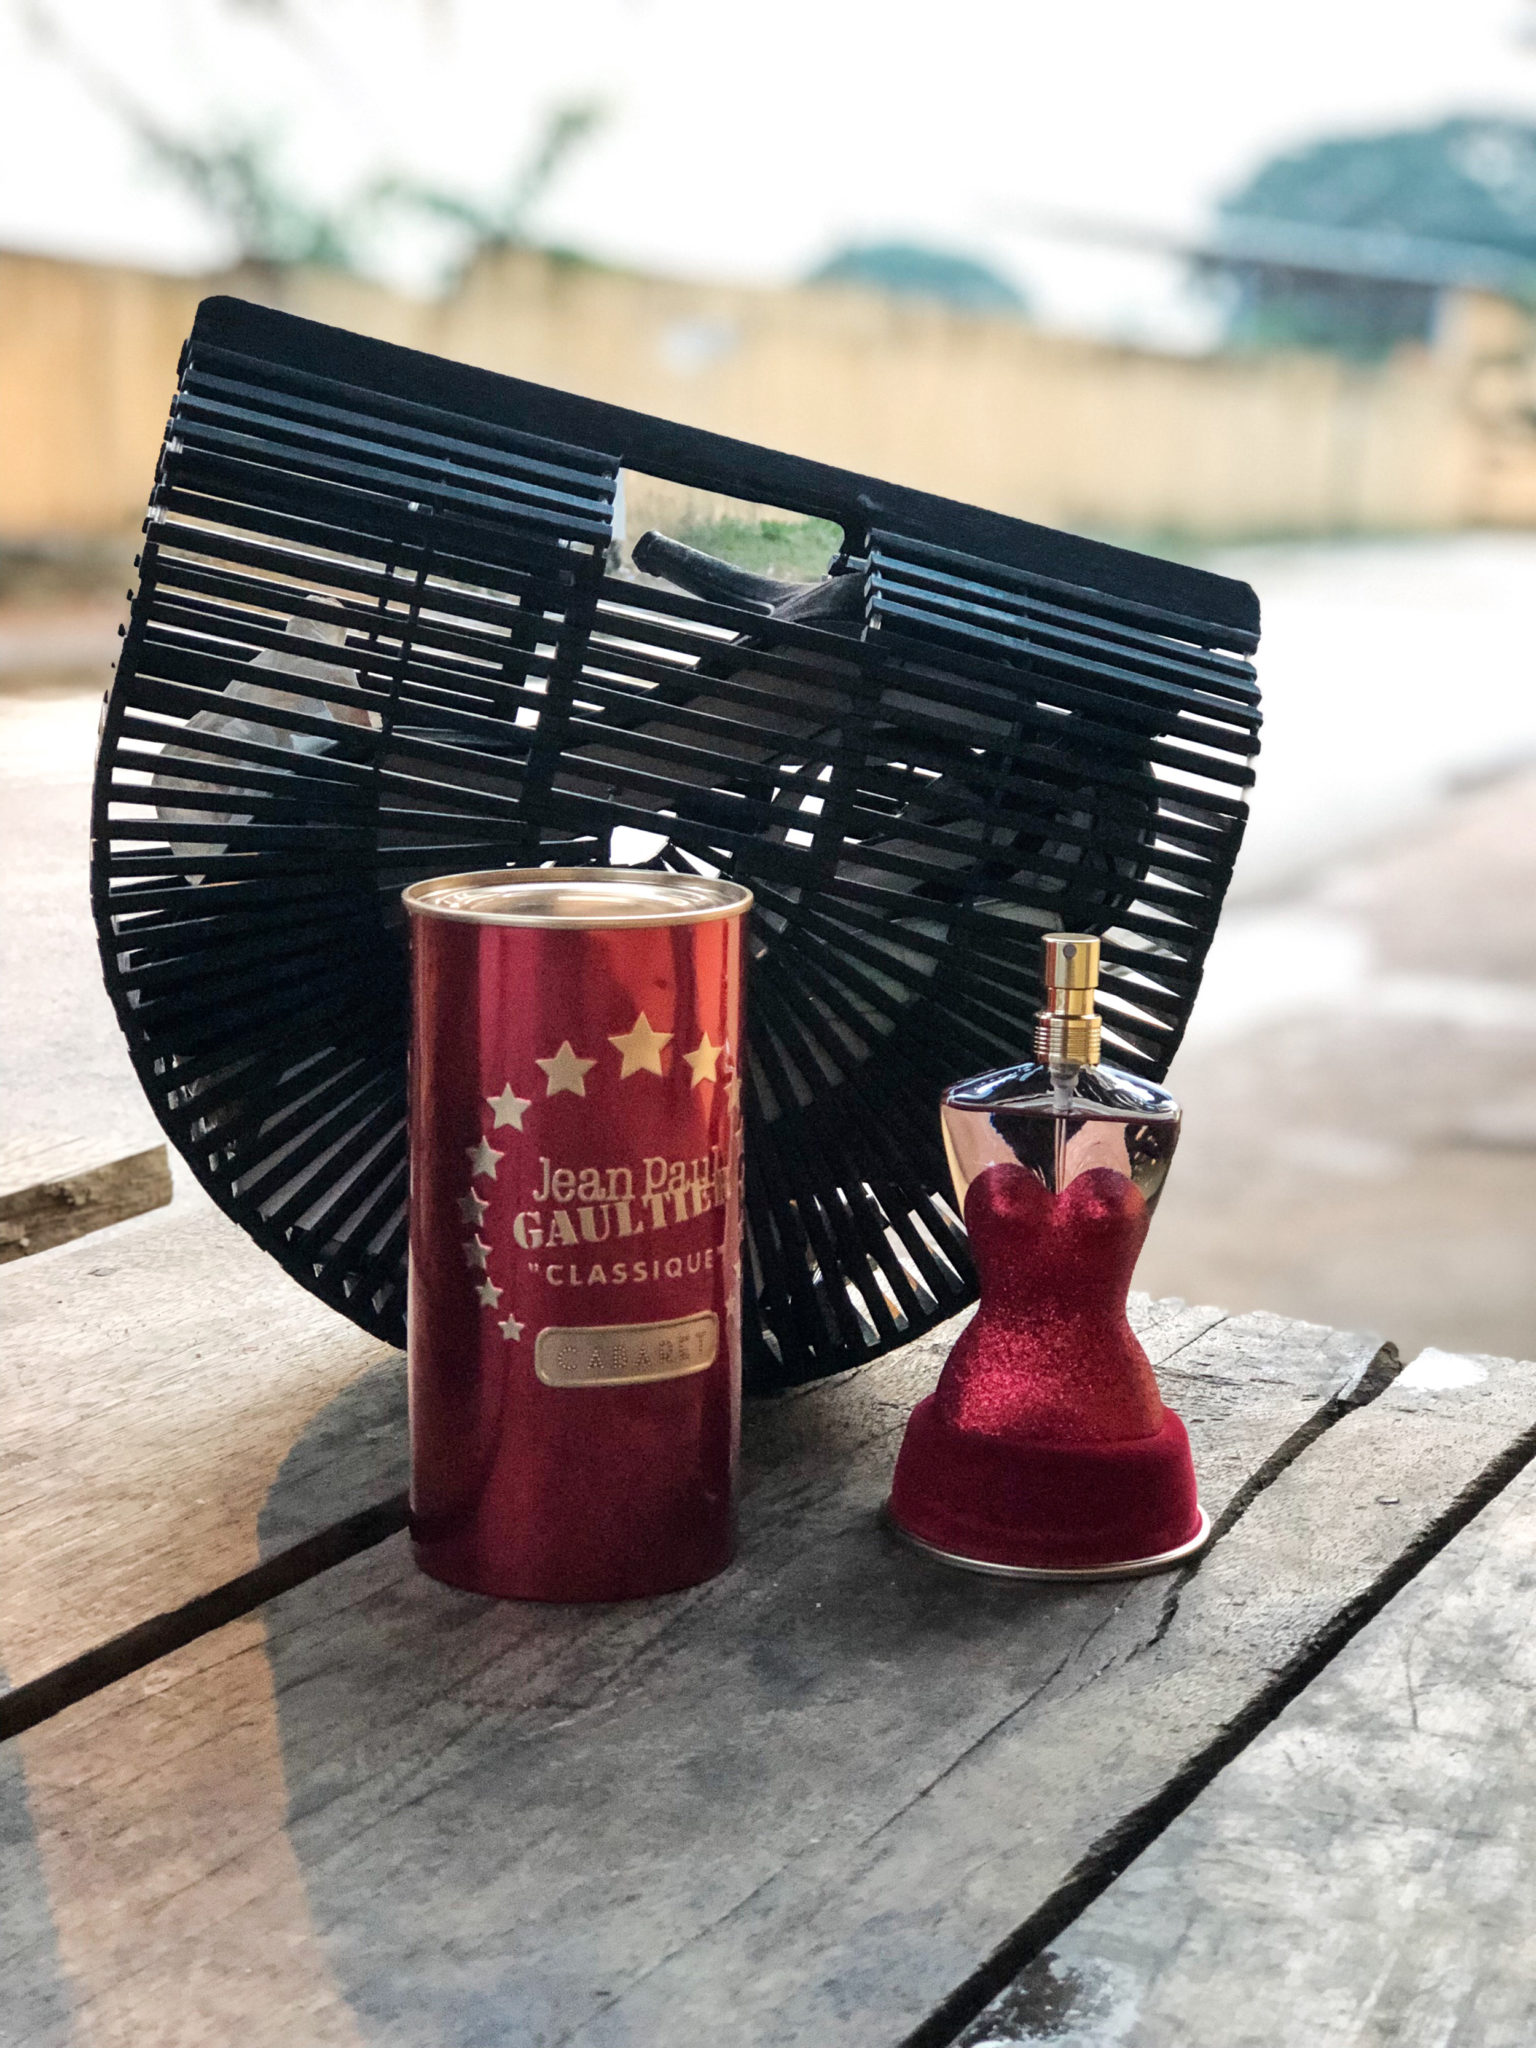 tendance parfums jean paul gaultier classique cabaret 03